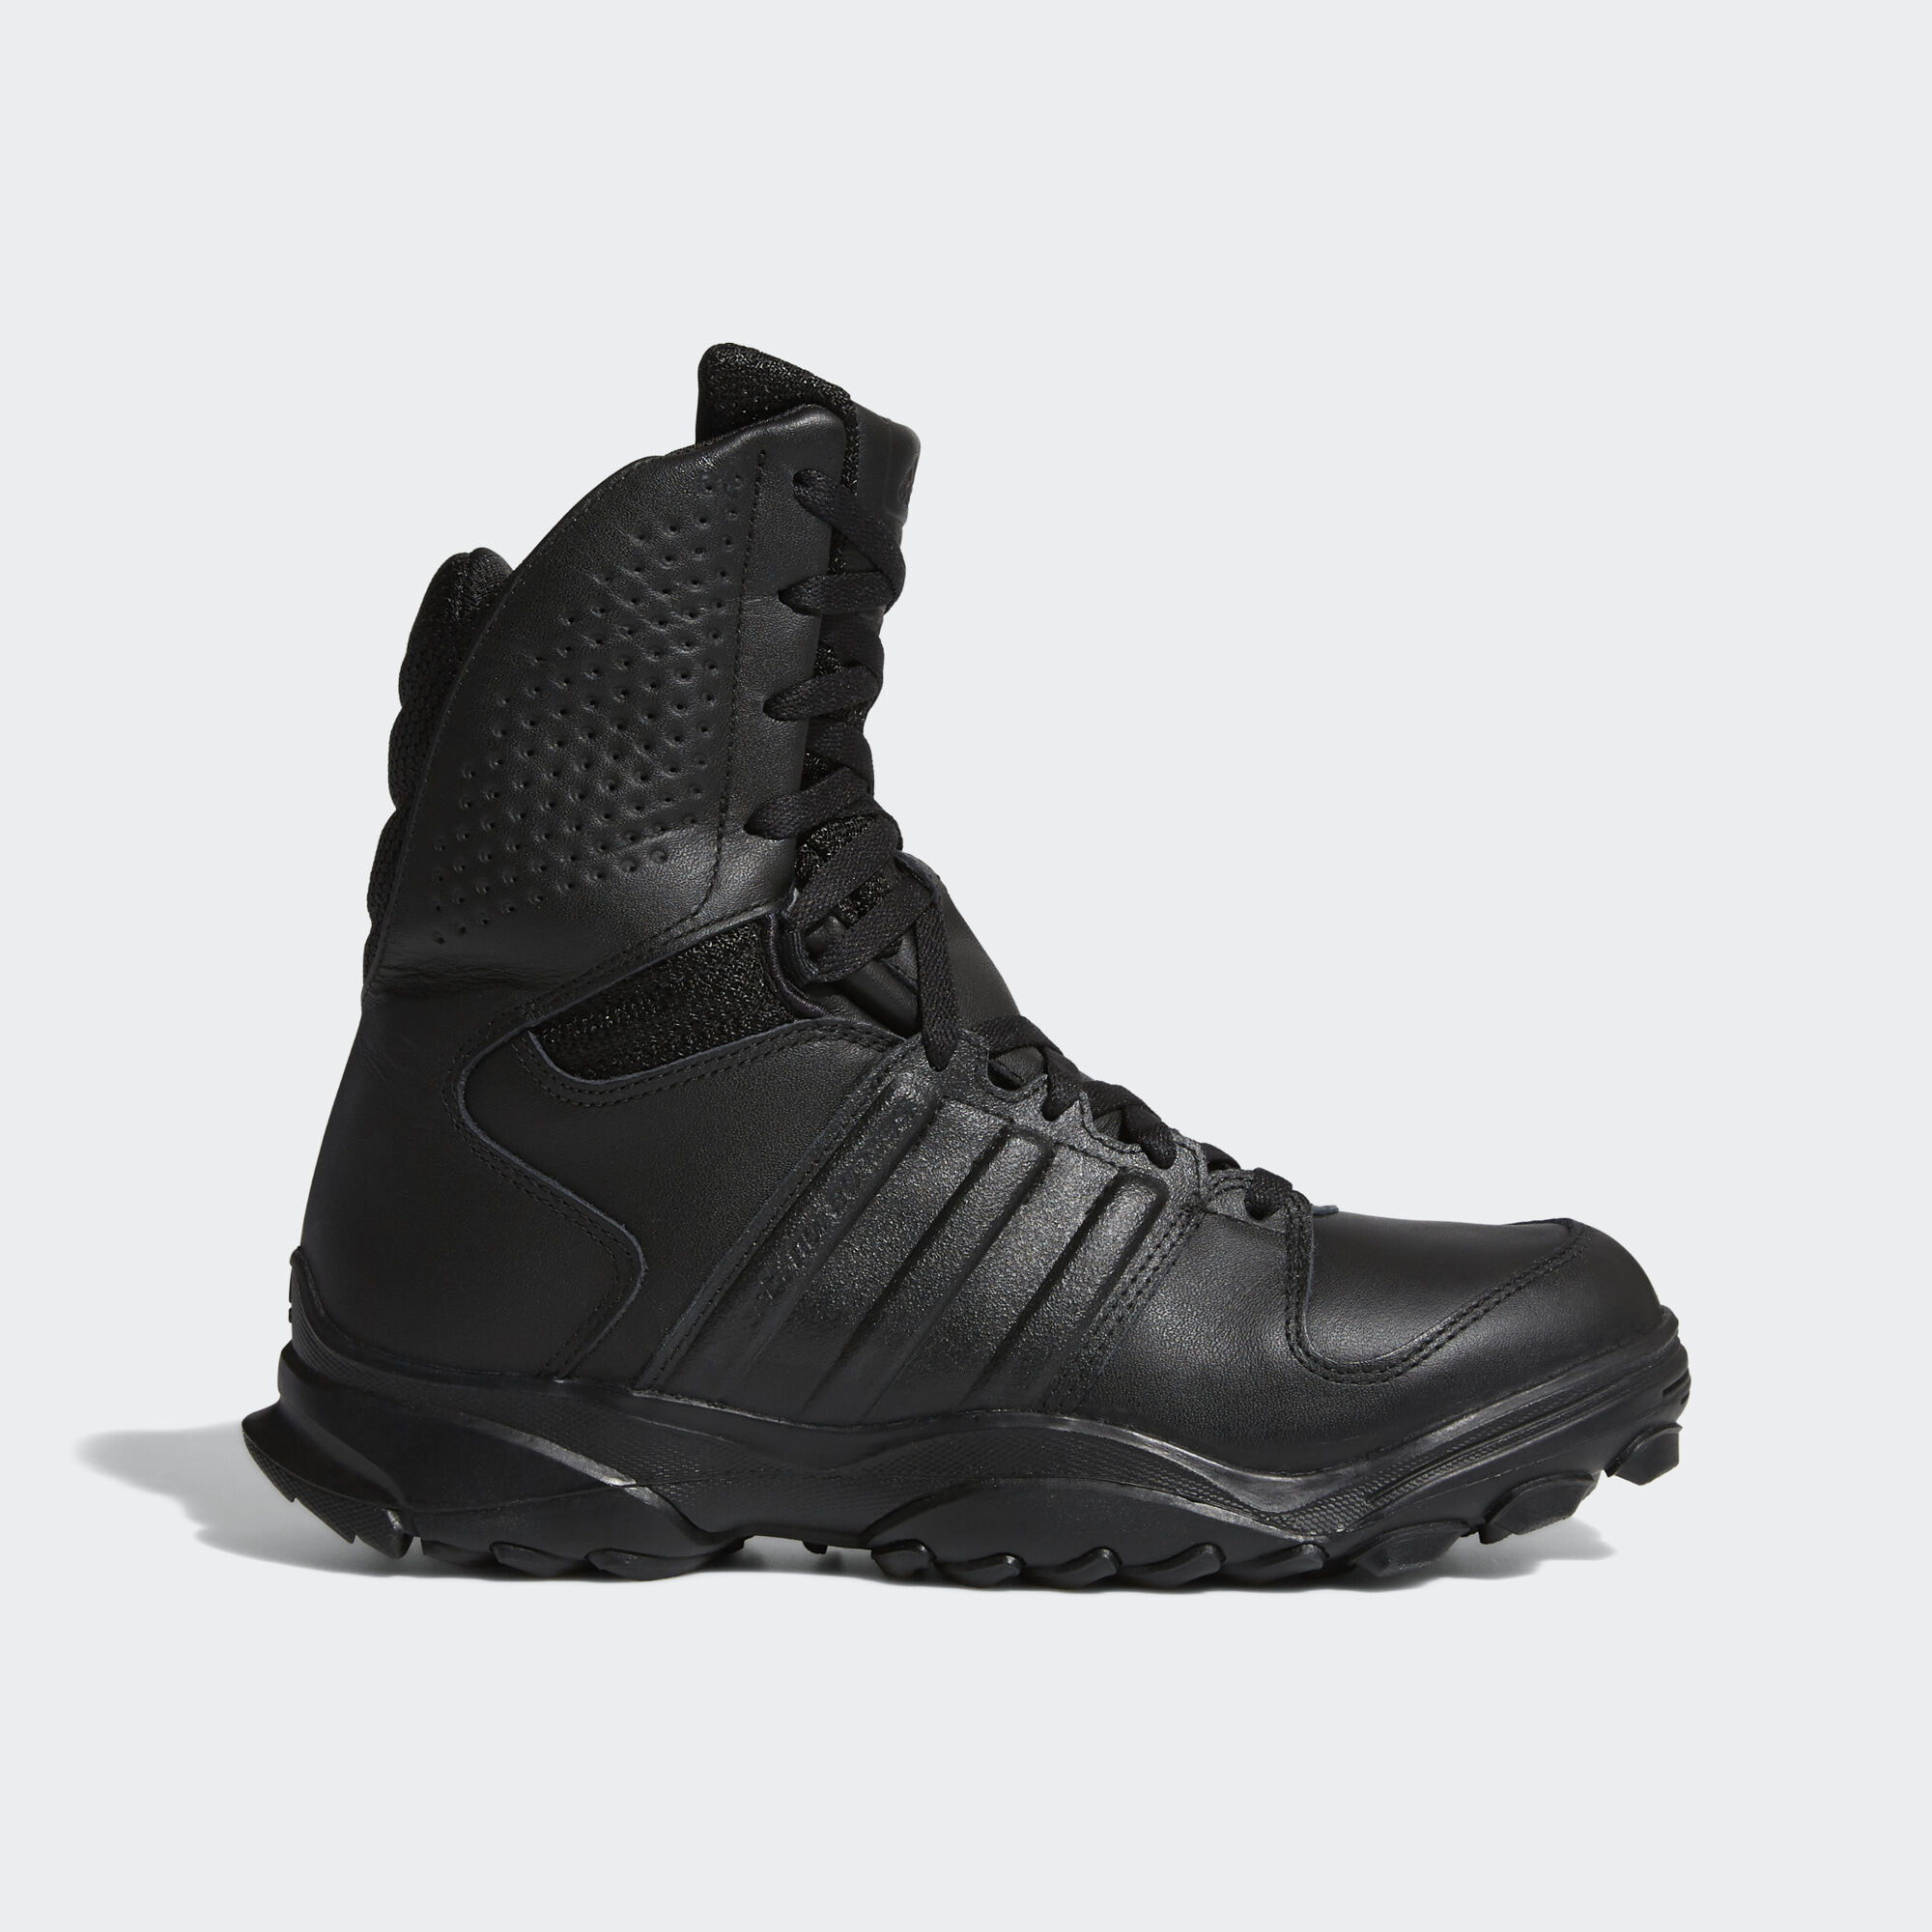 Adidas Chaussure Pas Intervention Cher tsdhQrC